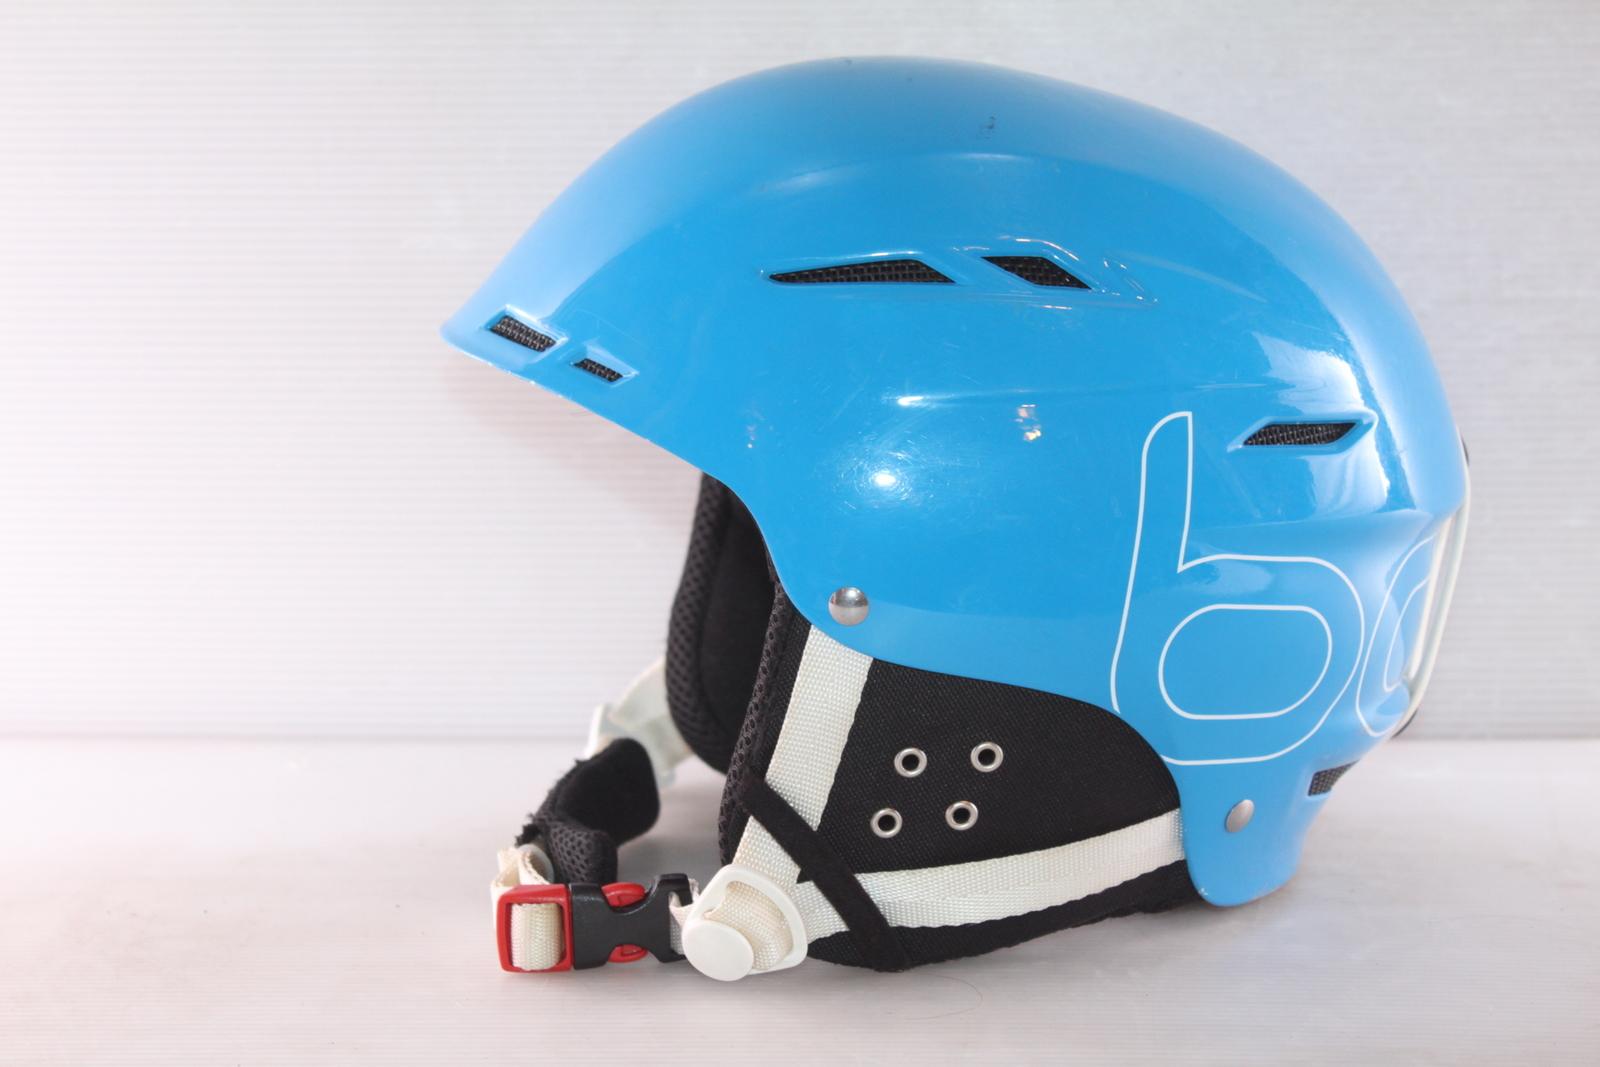 Dámská lyžařská helma Bolle B-Fun - posuvná vel. 54 - 58